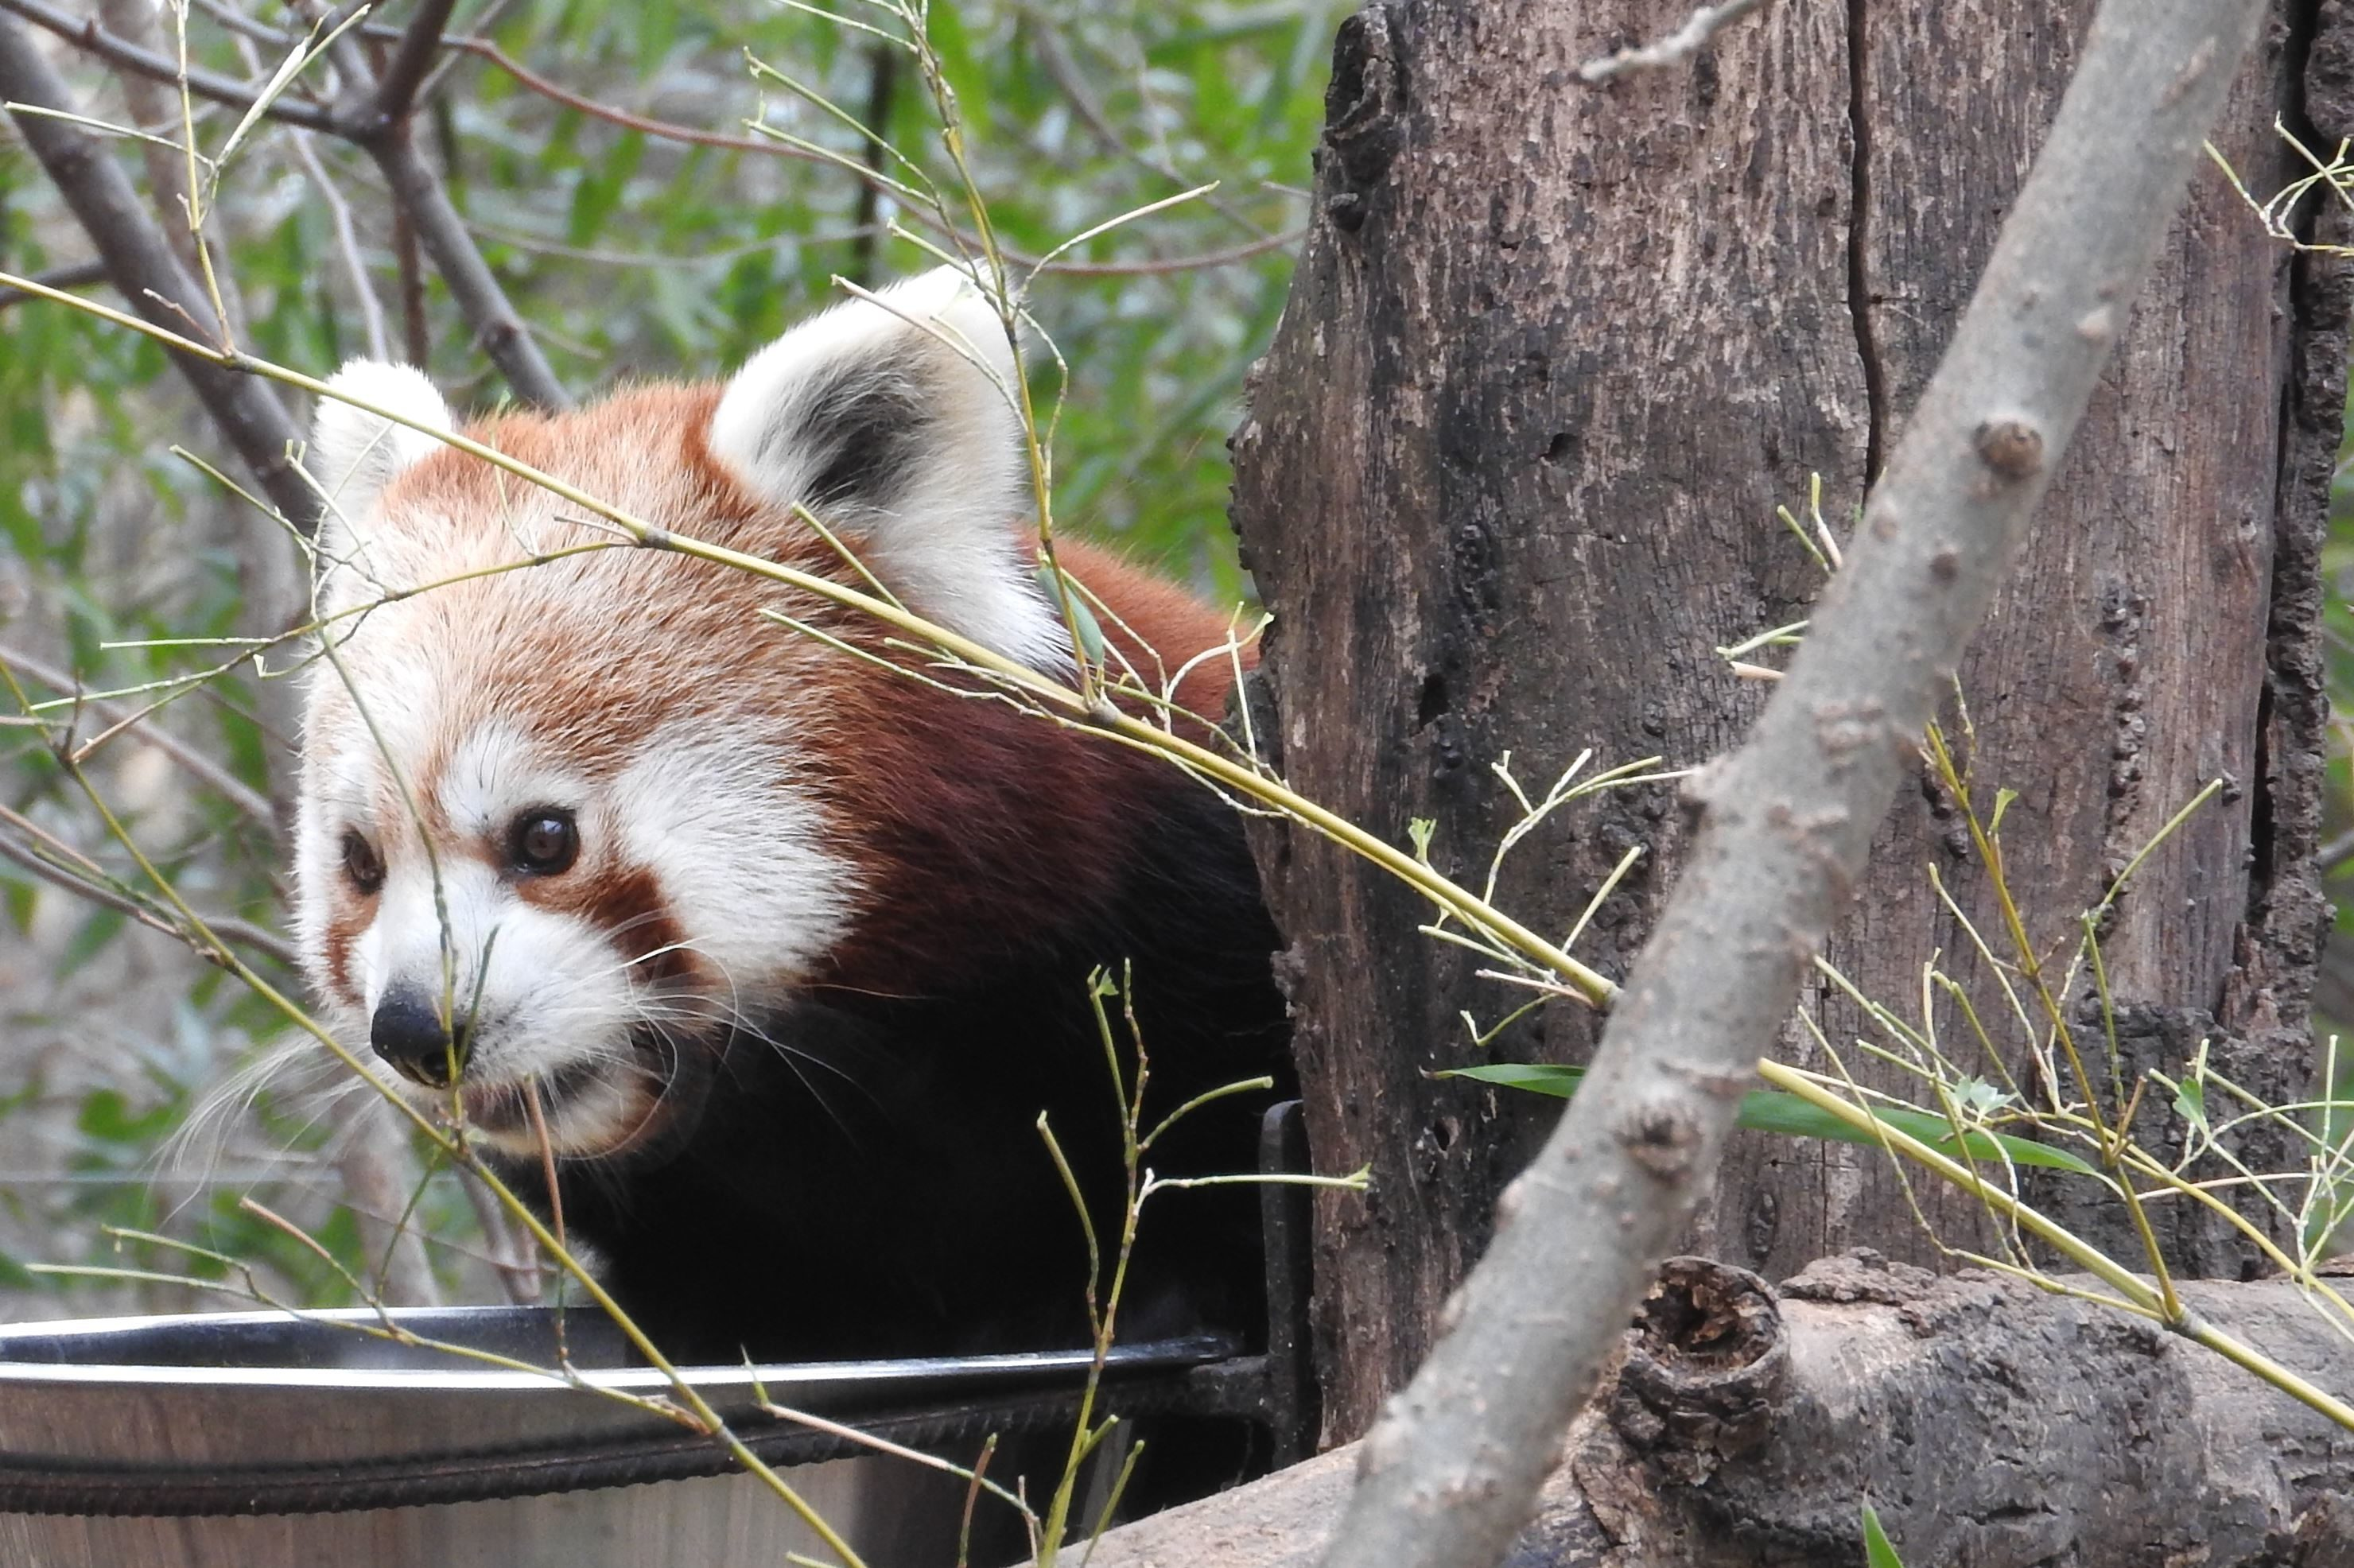 free picture  bear  cute  animal  fauna  red koala